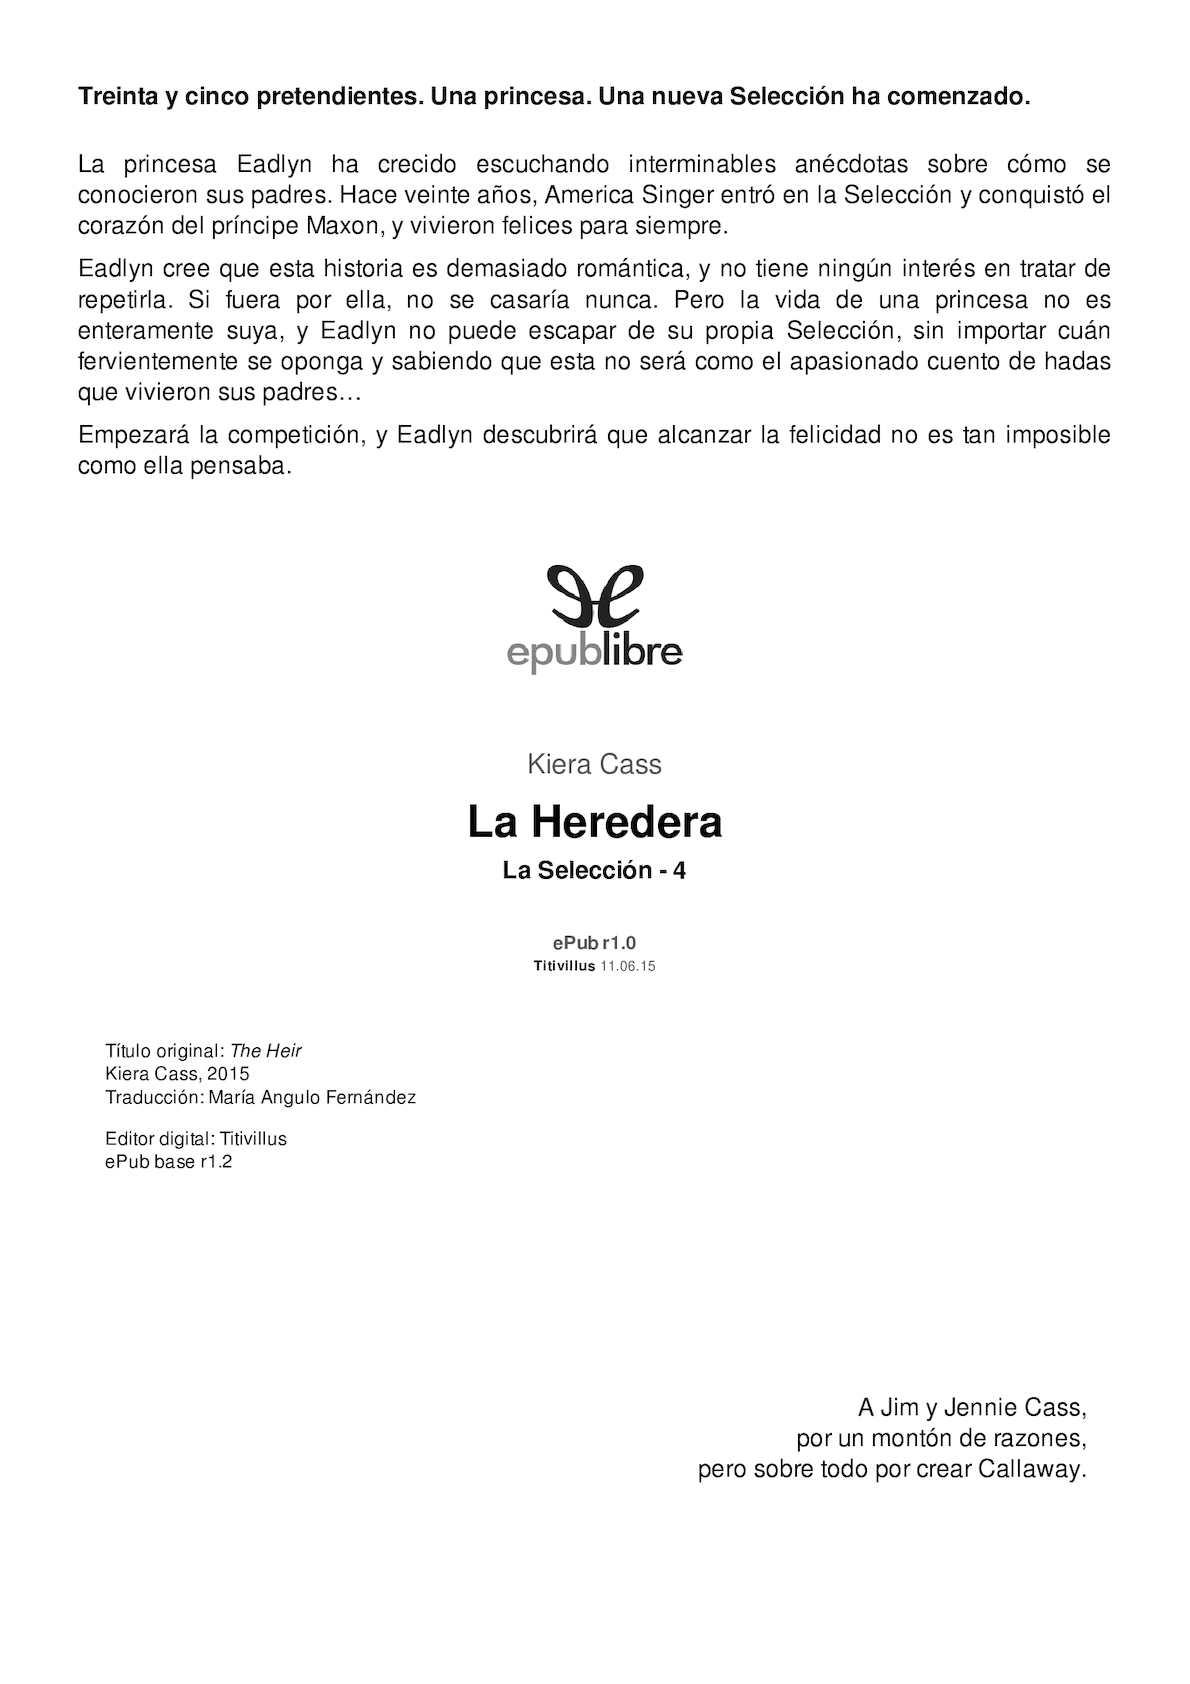 Calaméo - Cass, Kiera [La Seleccion 04] La Heredera [23045] (R1 0) (1)